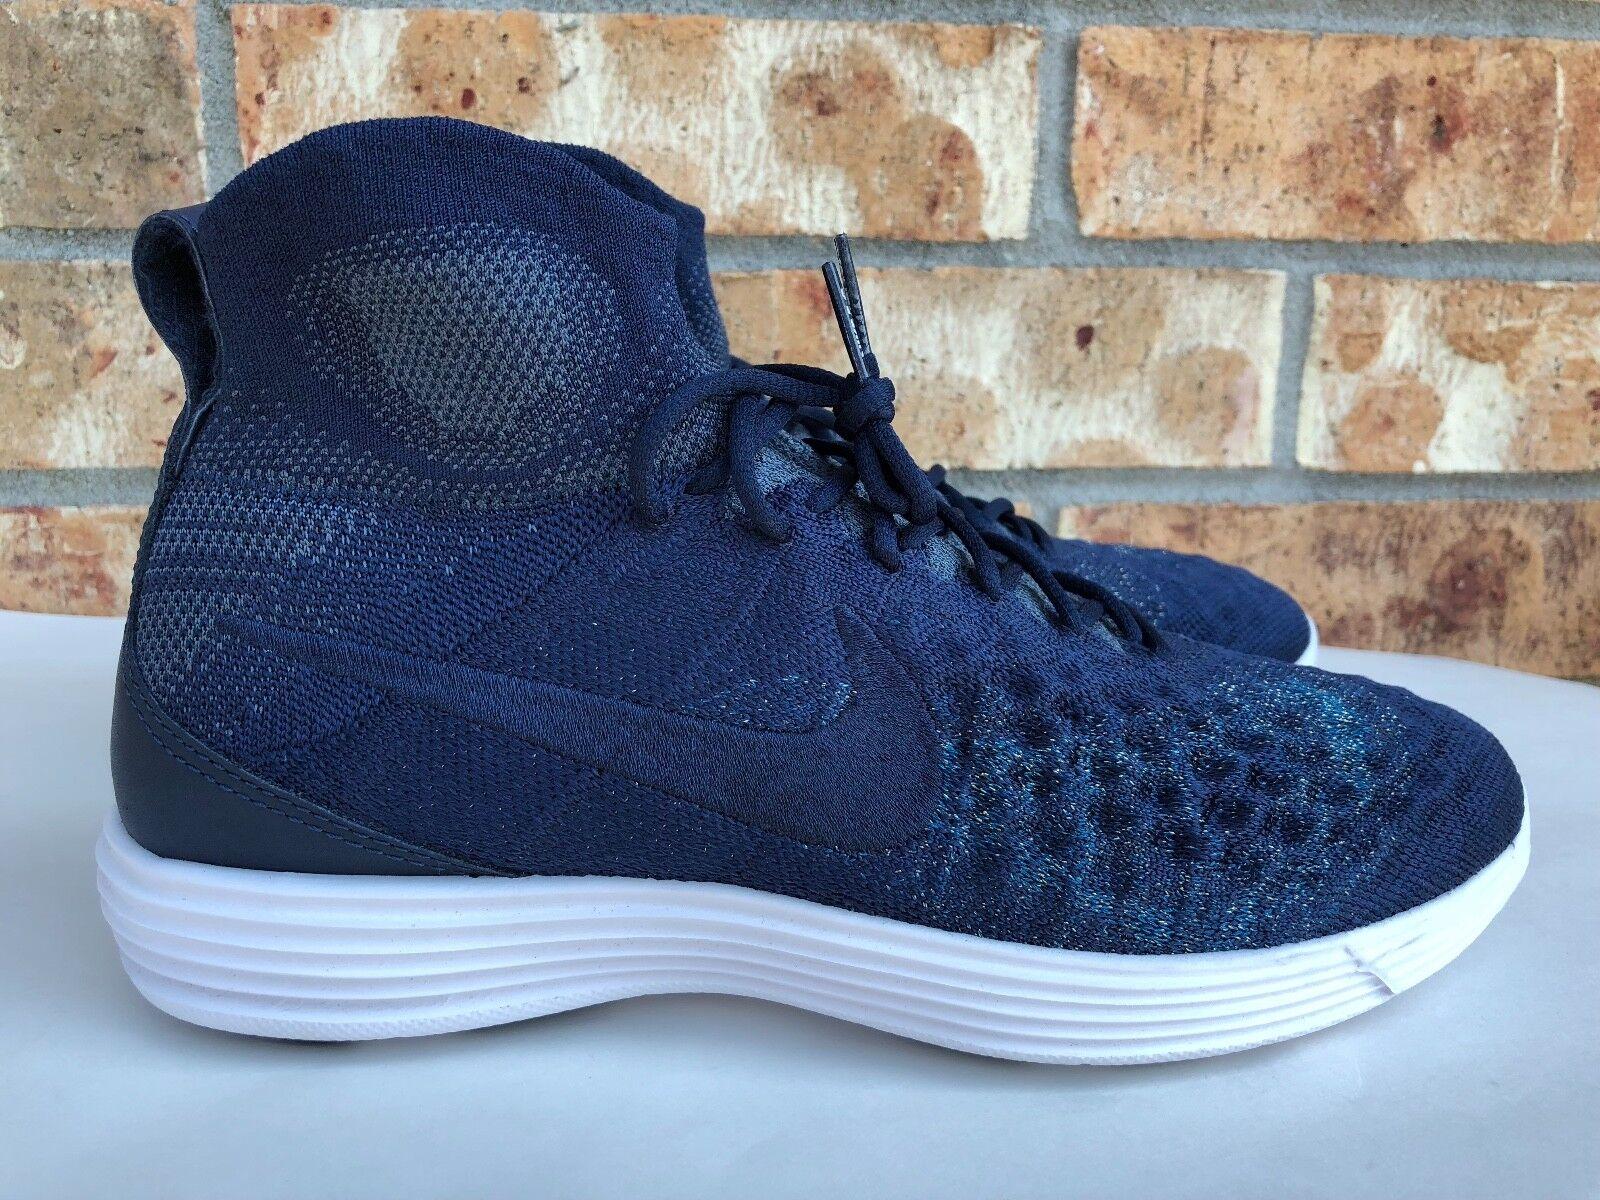 Men's Nike Lunar Magista II Flyknit FC Training shoes Size 8-10.5 876385 400